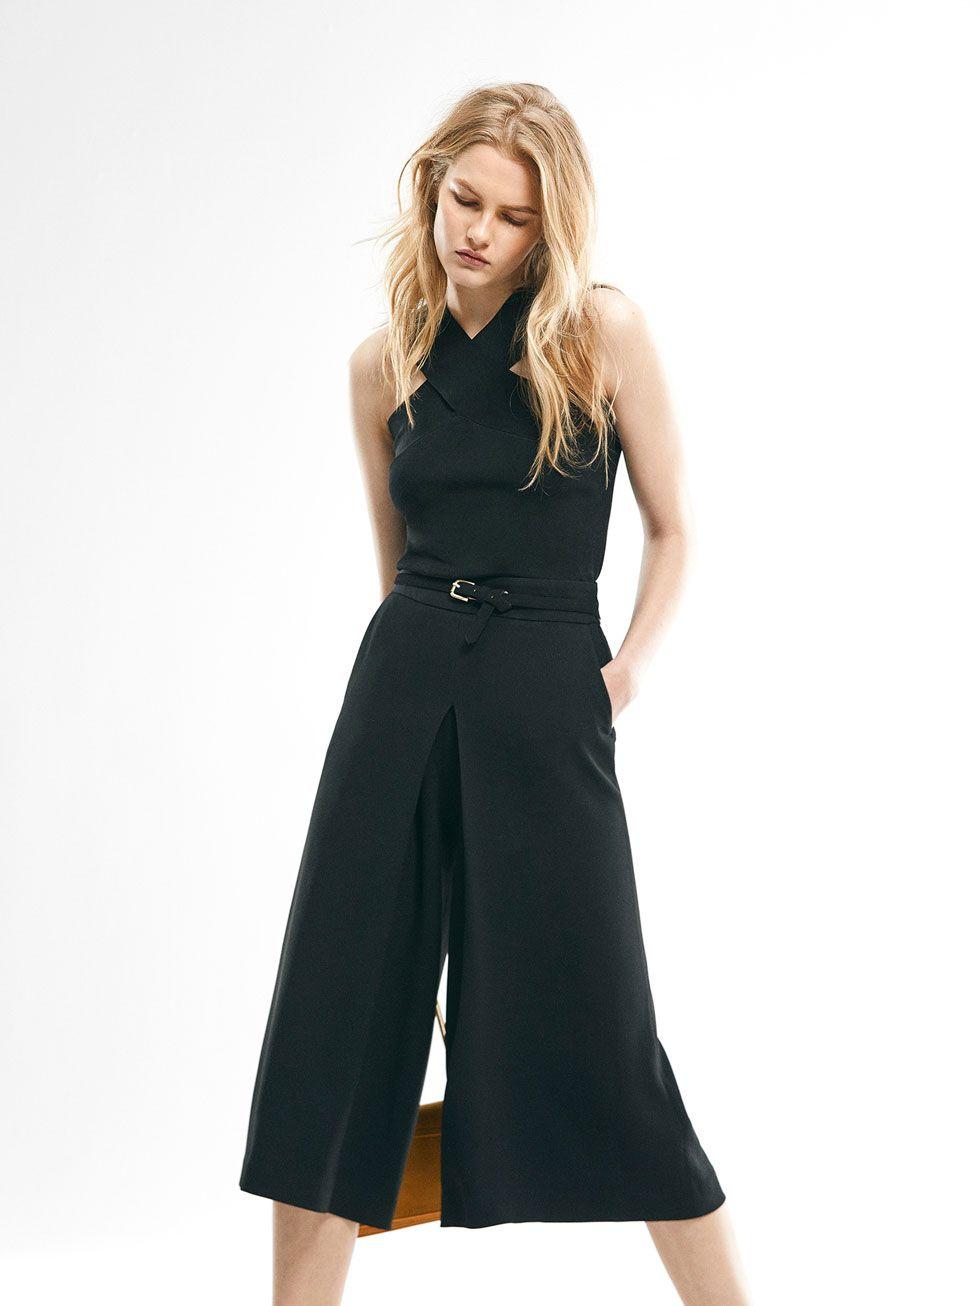 Schwarzer Hosenrock Limited Edition Fur Damen Hosen Alles